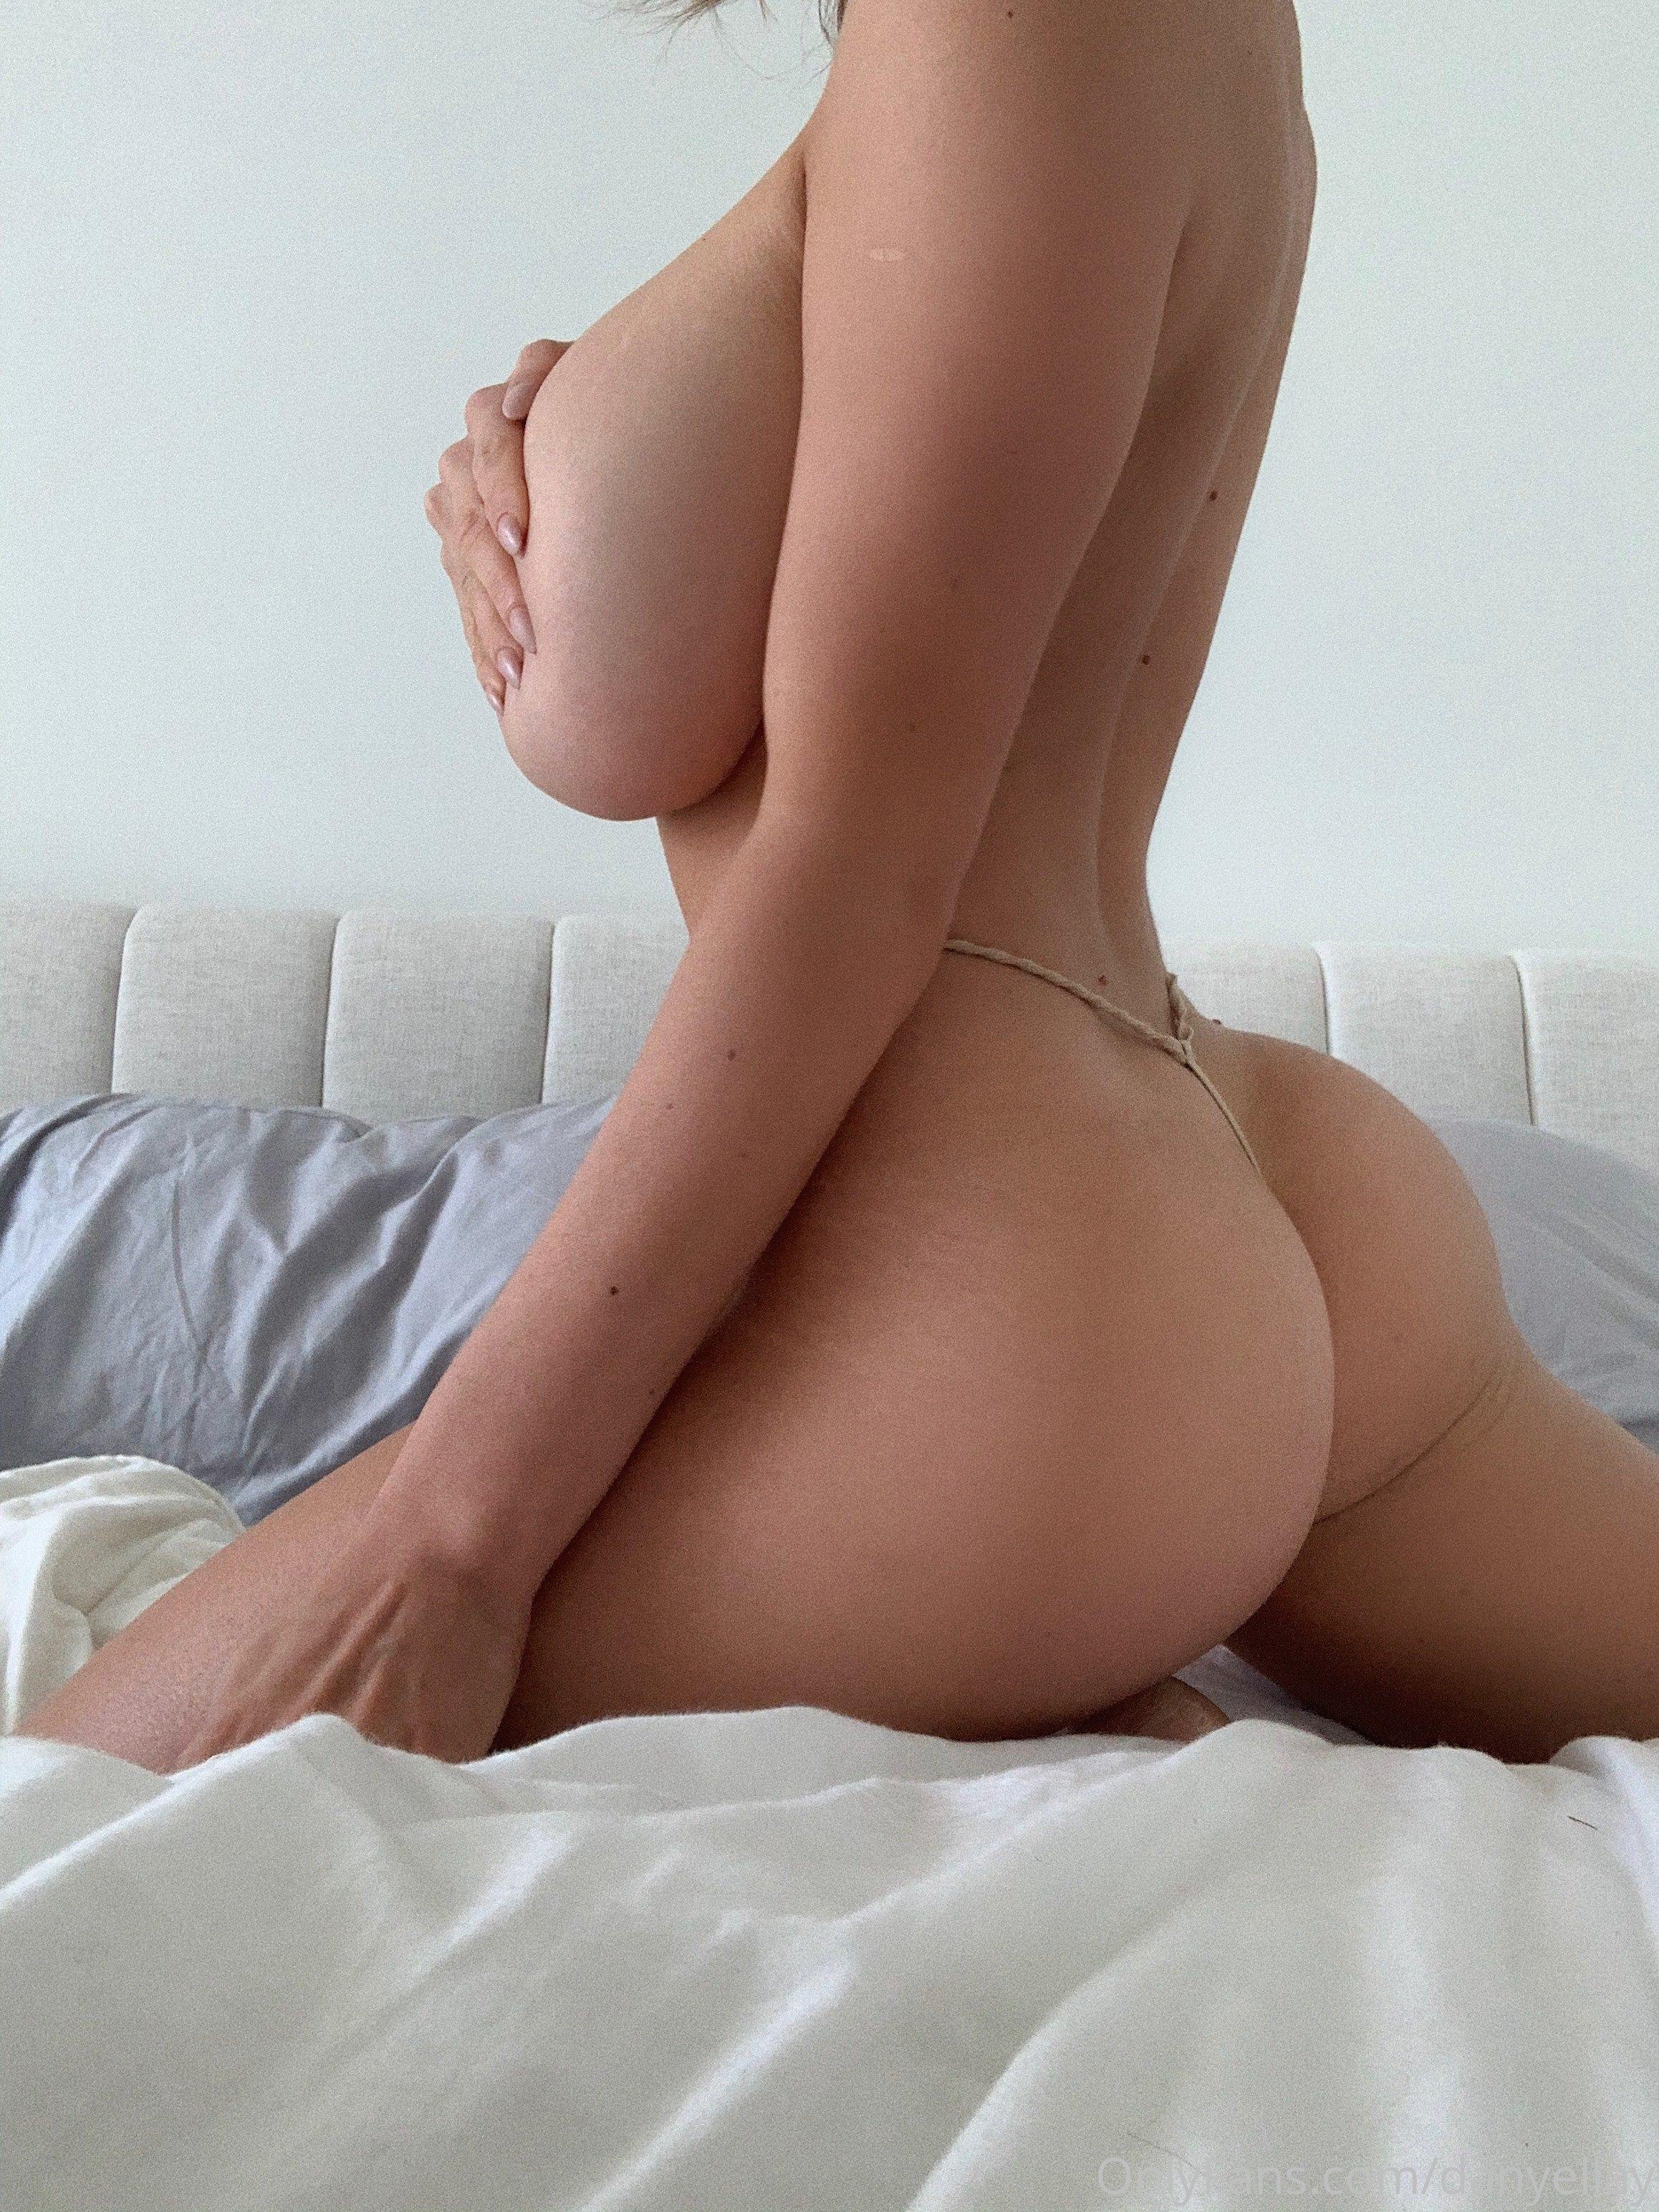 Danielley Ayala 0336